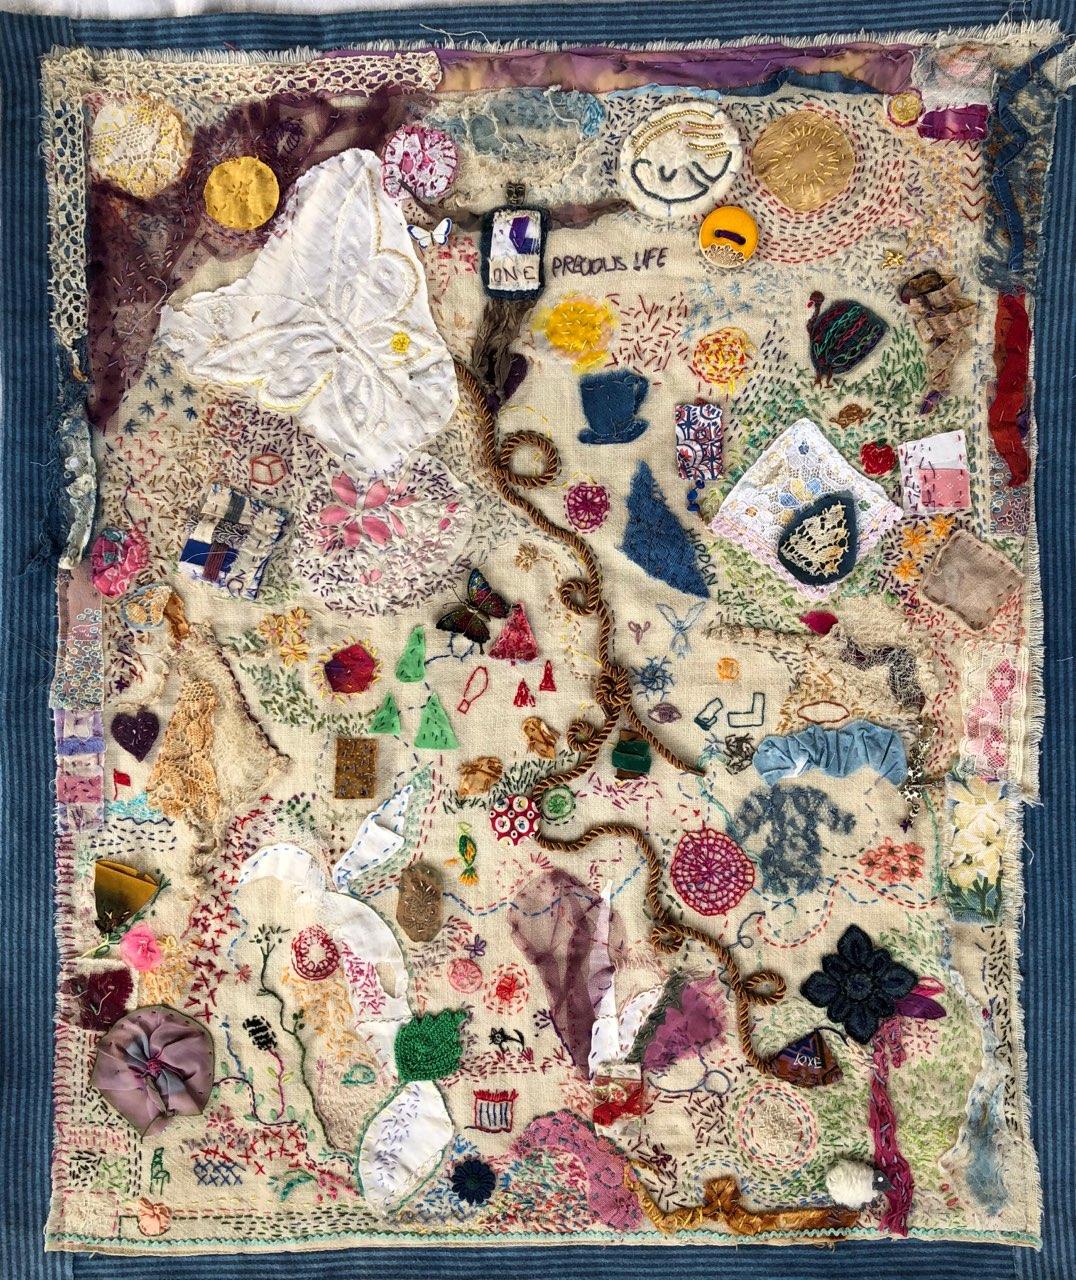 One Precious Life, fiber art by Kay Portmess (MG: July 2020)